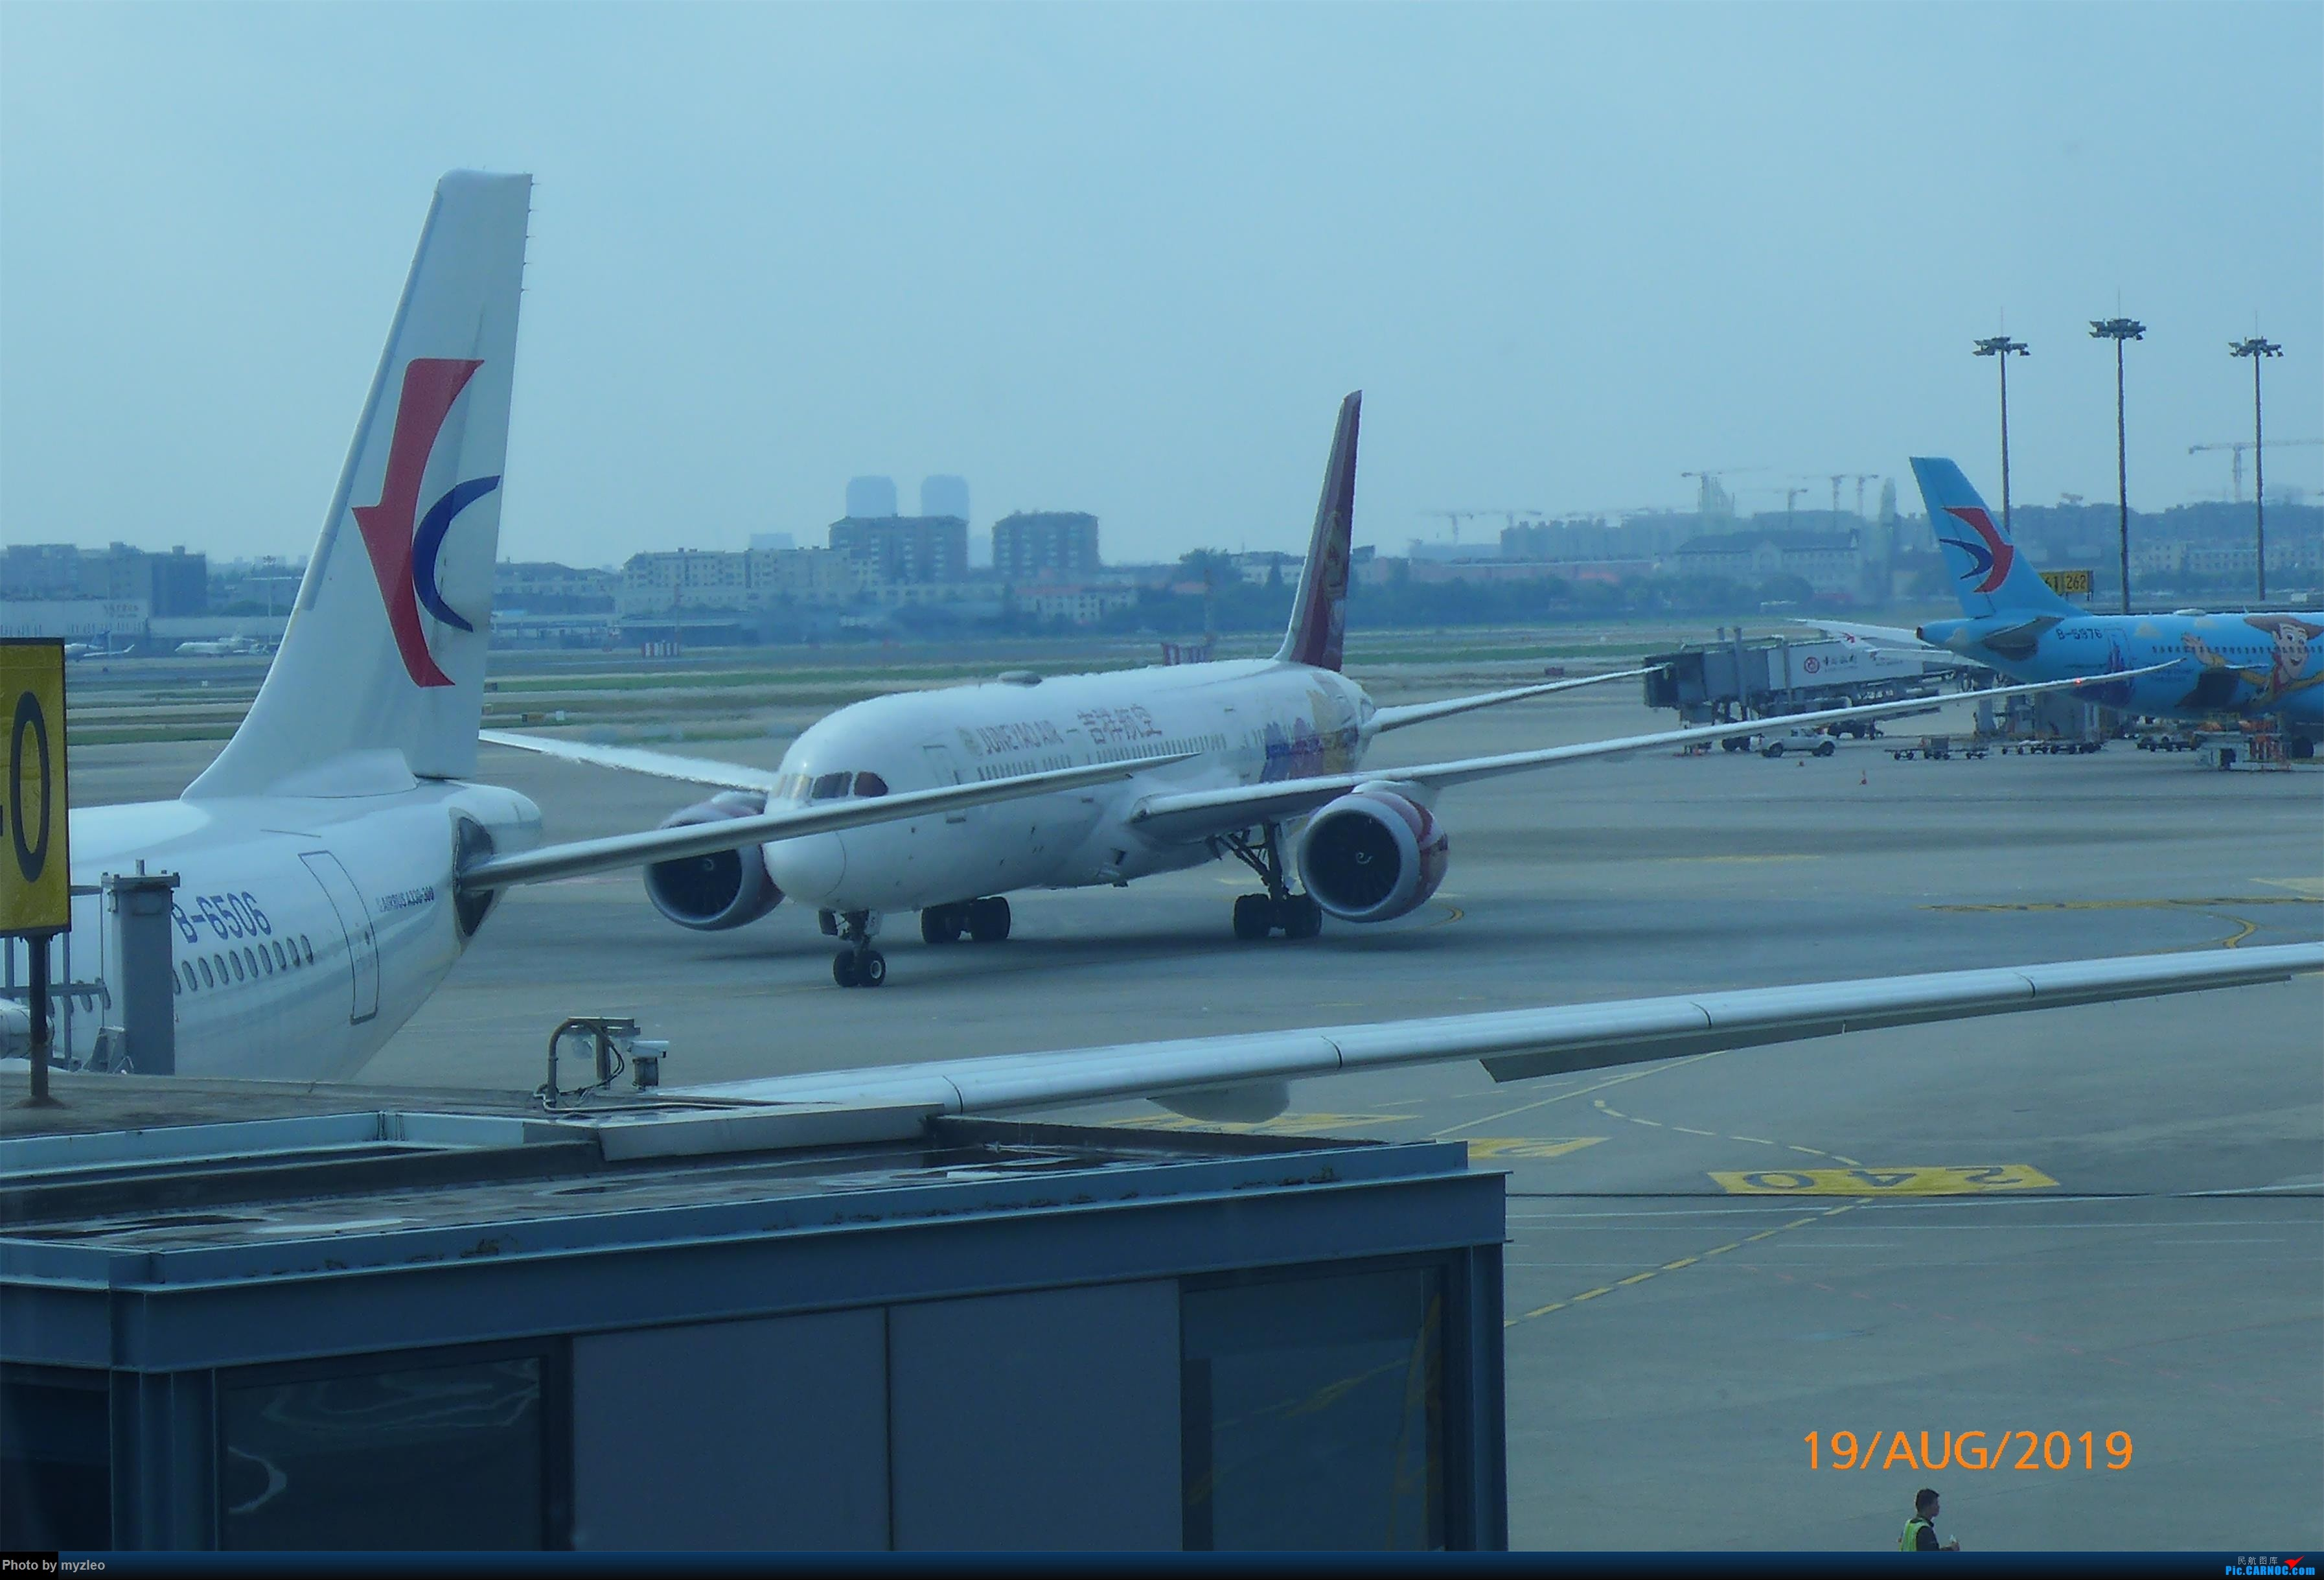 Re:[原创]【myzleo的游记5.1】梦圆一九(1)首搭国航359,北京城里到处走 BOEING 787-9 B-1115 中国上海虹桥国际机场